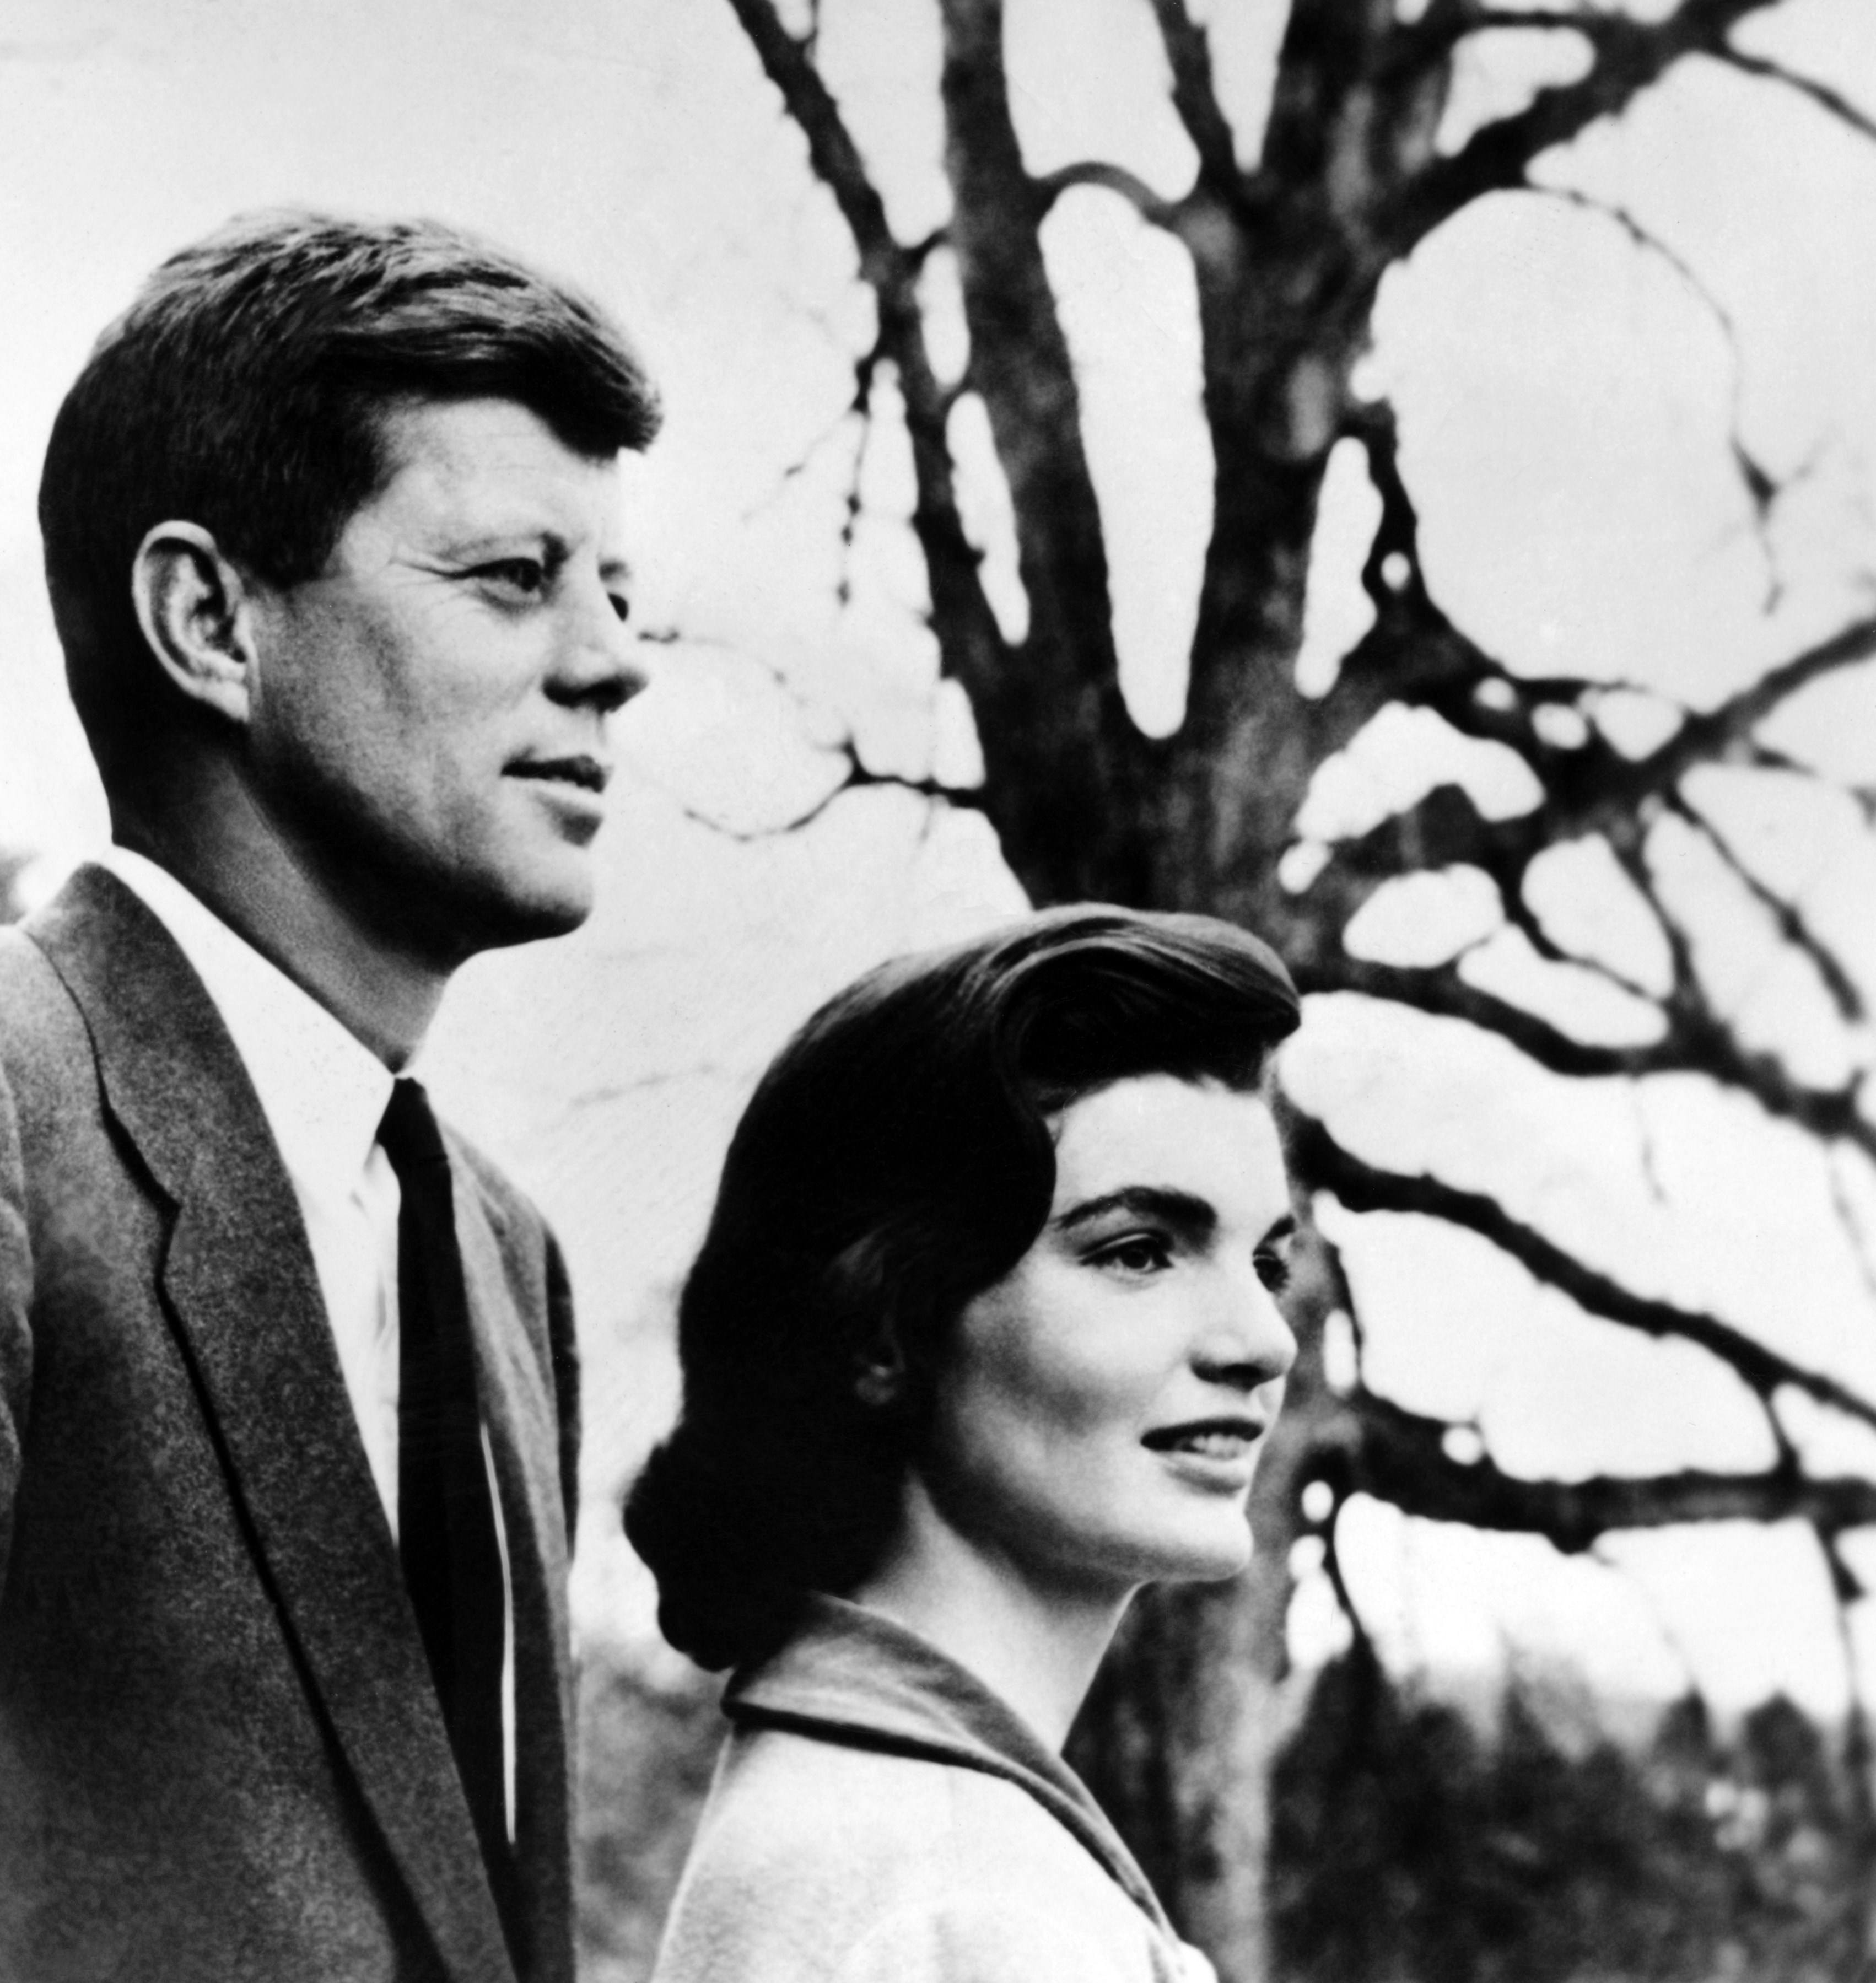 Senator John Fitzgerald Kennedy (JFK) his wife Jacqueline Kennedy